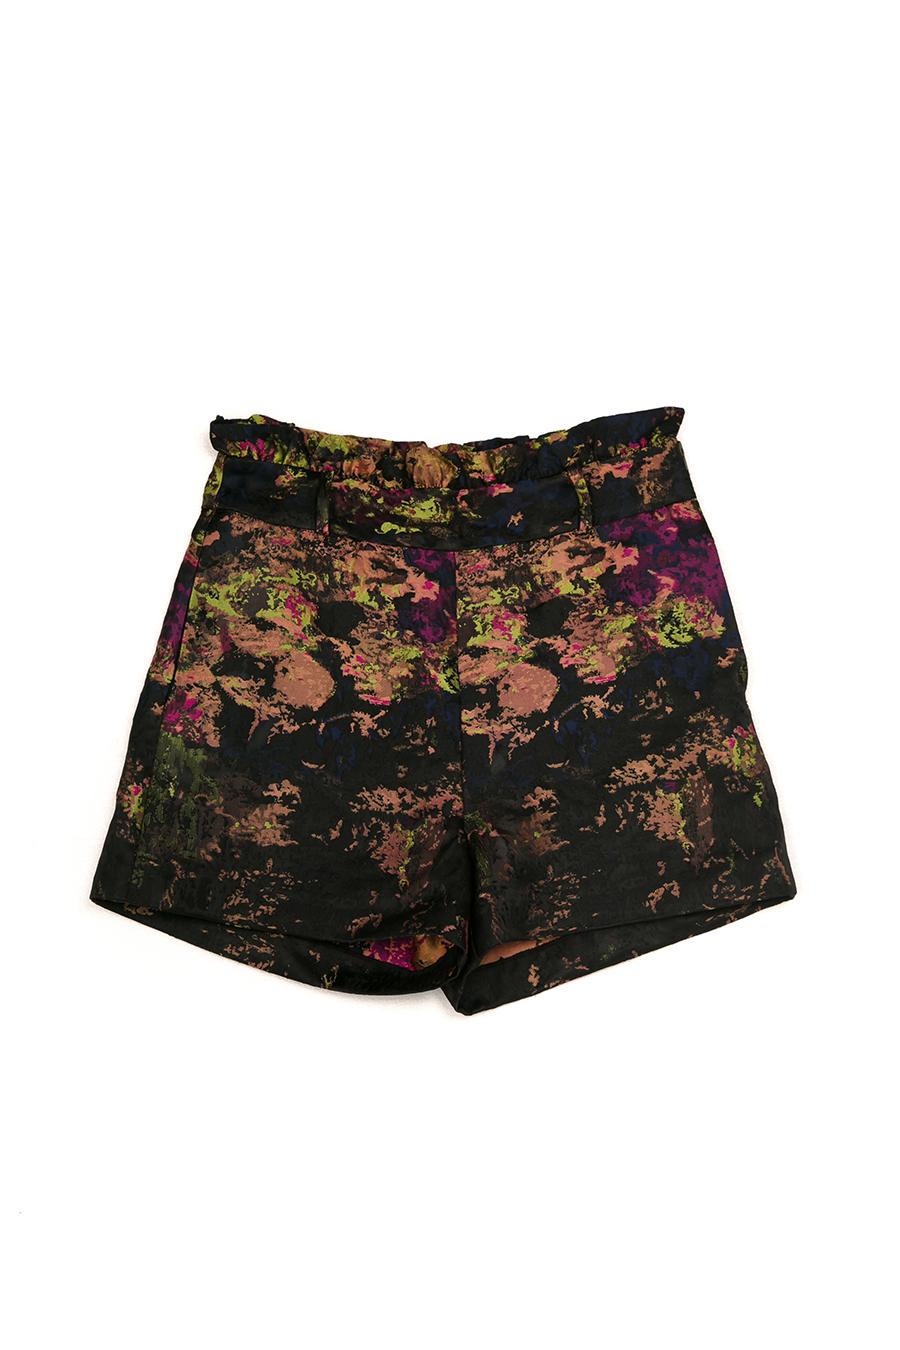 TIMIC shorts pic